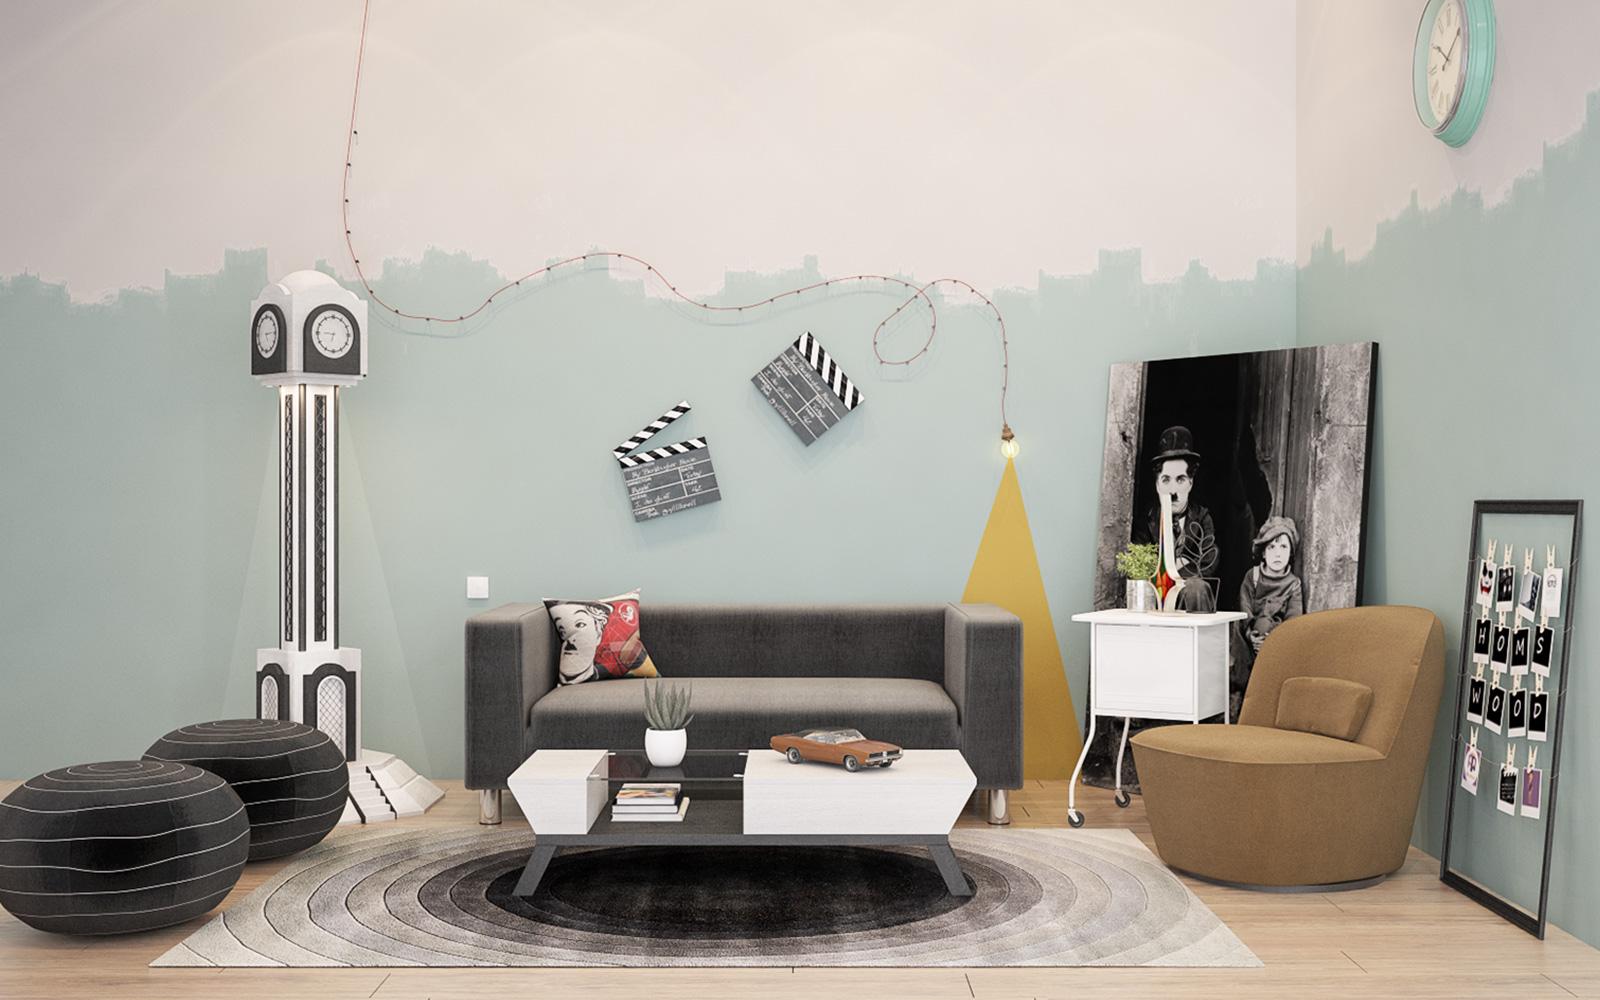 Vogue Design - Istanbul Homswood Studio2